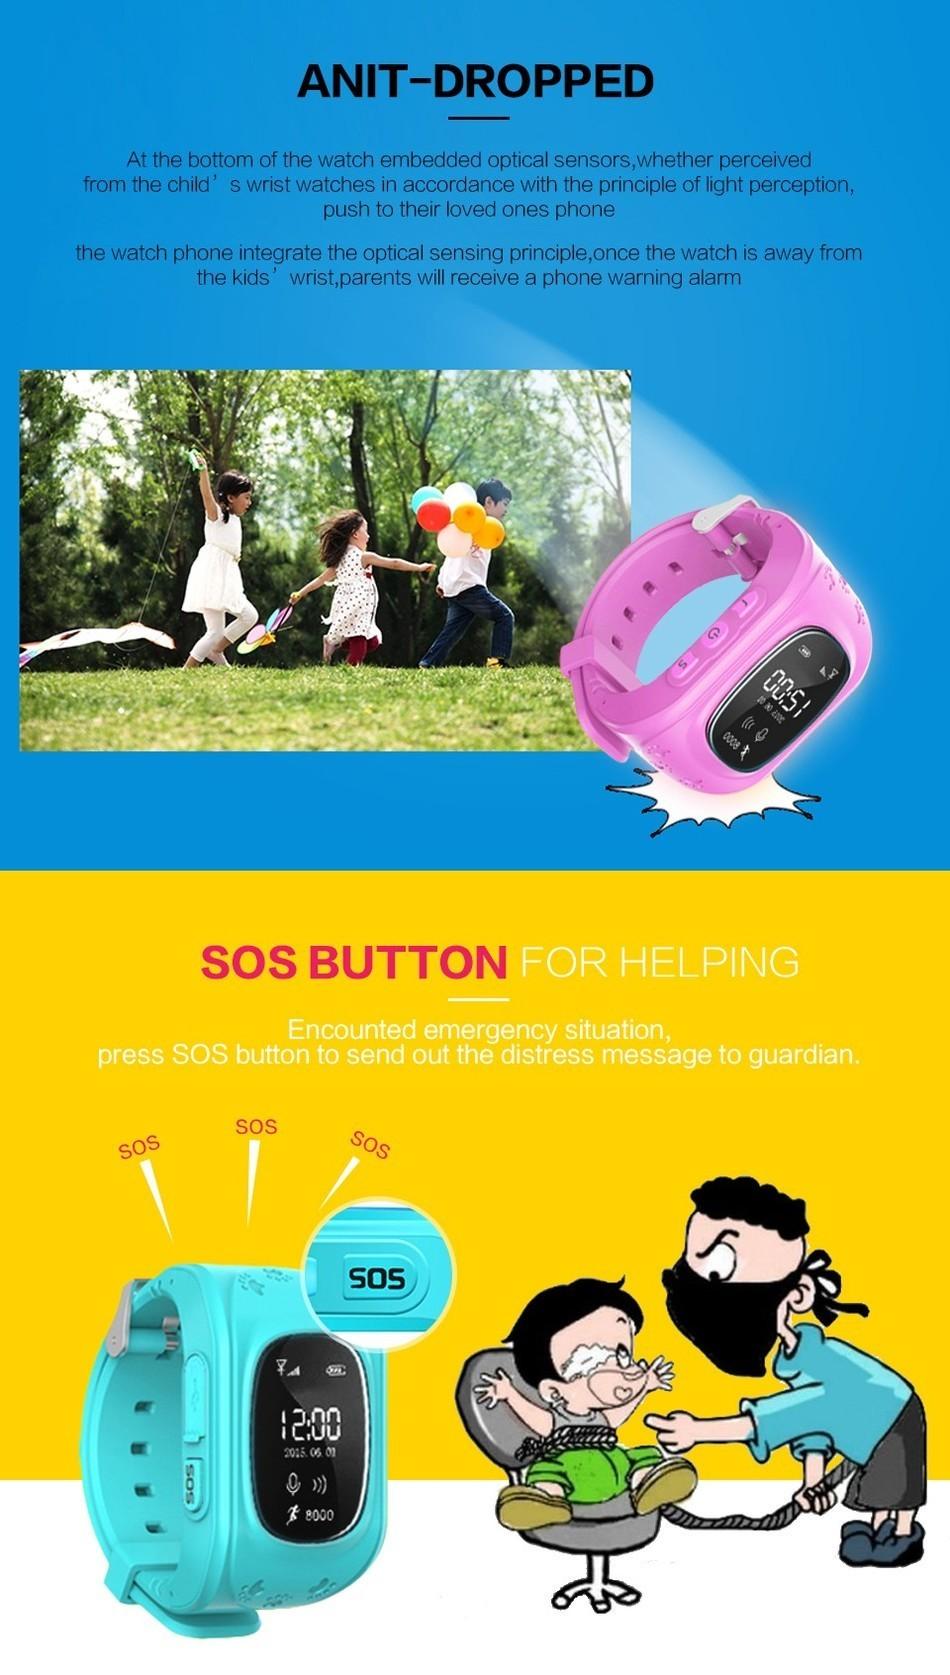 Harga Dan Spesifikasi Bipbip Kids Tracker Watch Update 2018 V01 Gps Garansi 1 Tahun High Quality 096oled Screen Smart Baby Q50 Lbs Sos